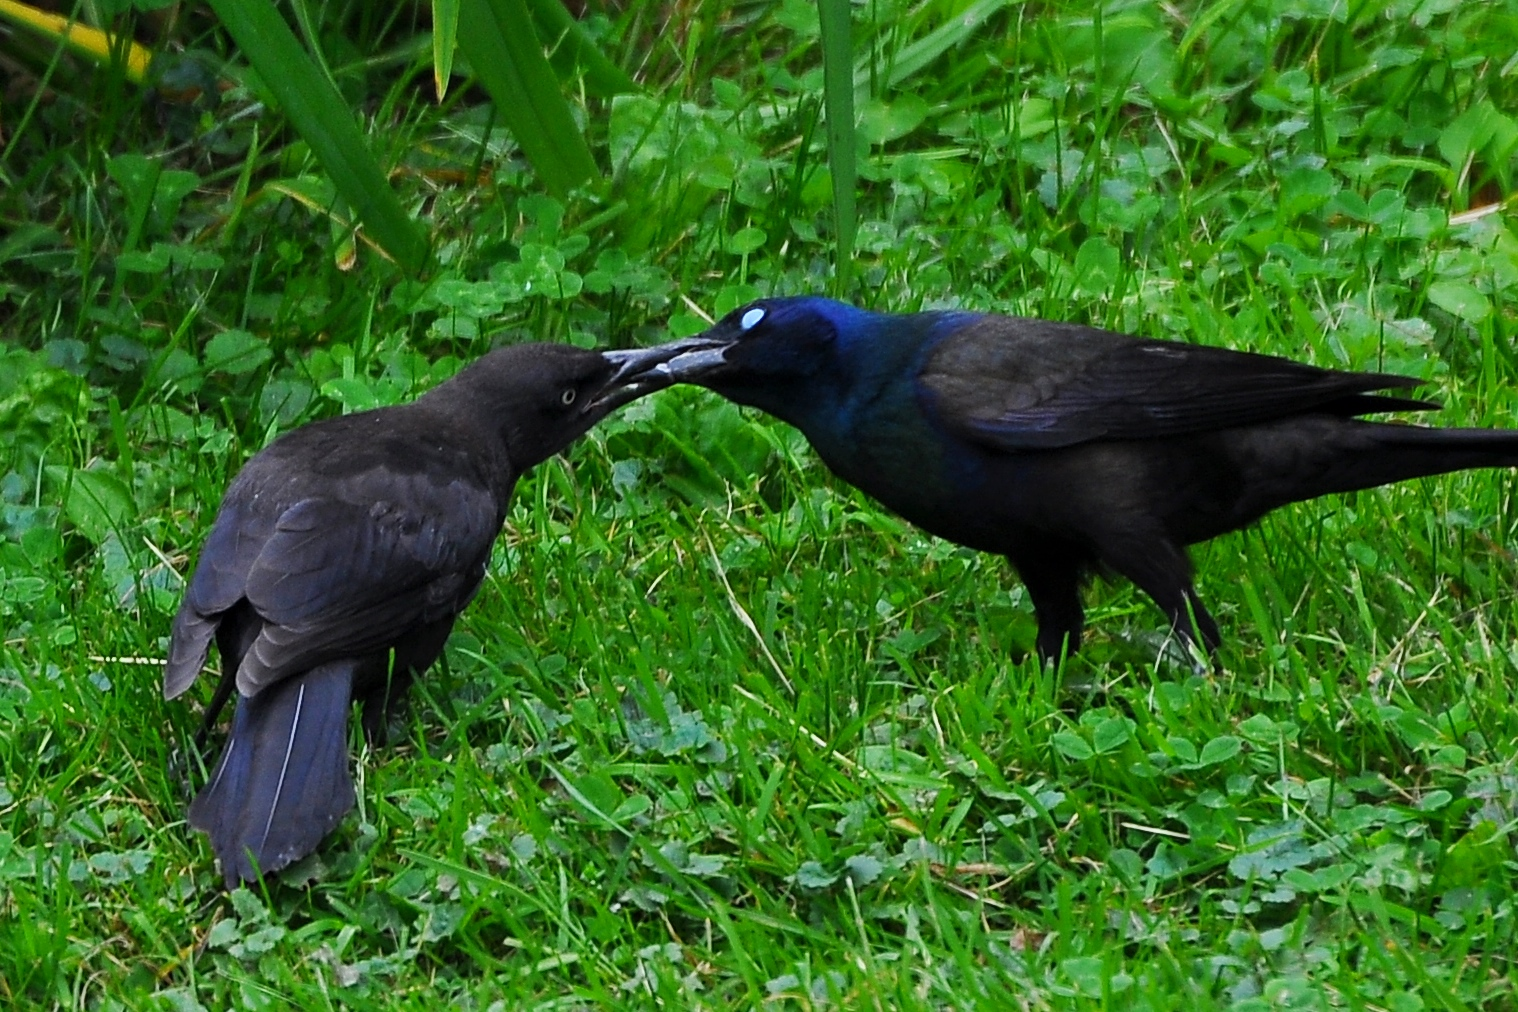 fledgling grackle - photo #10